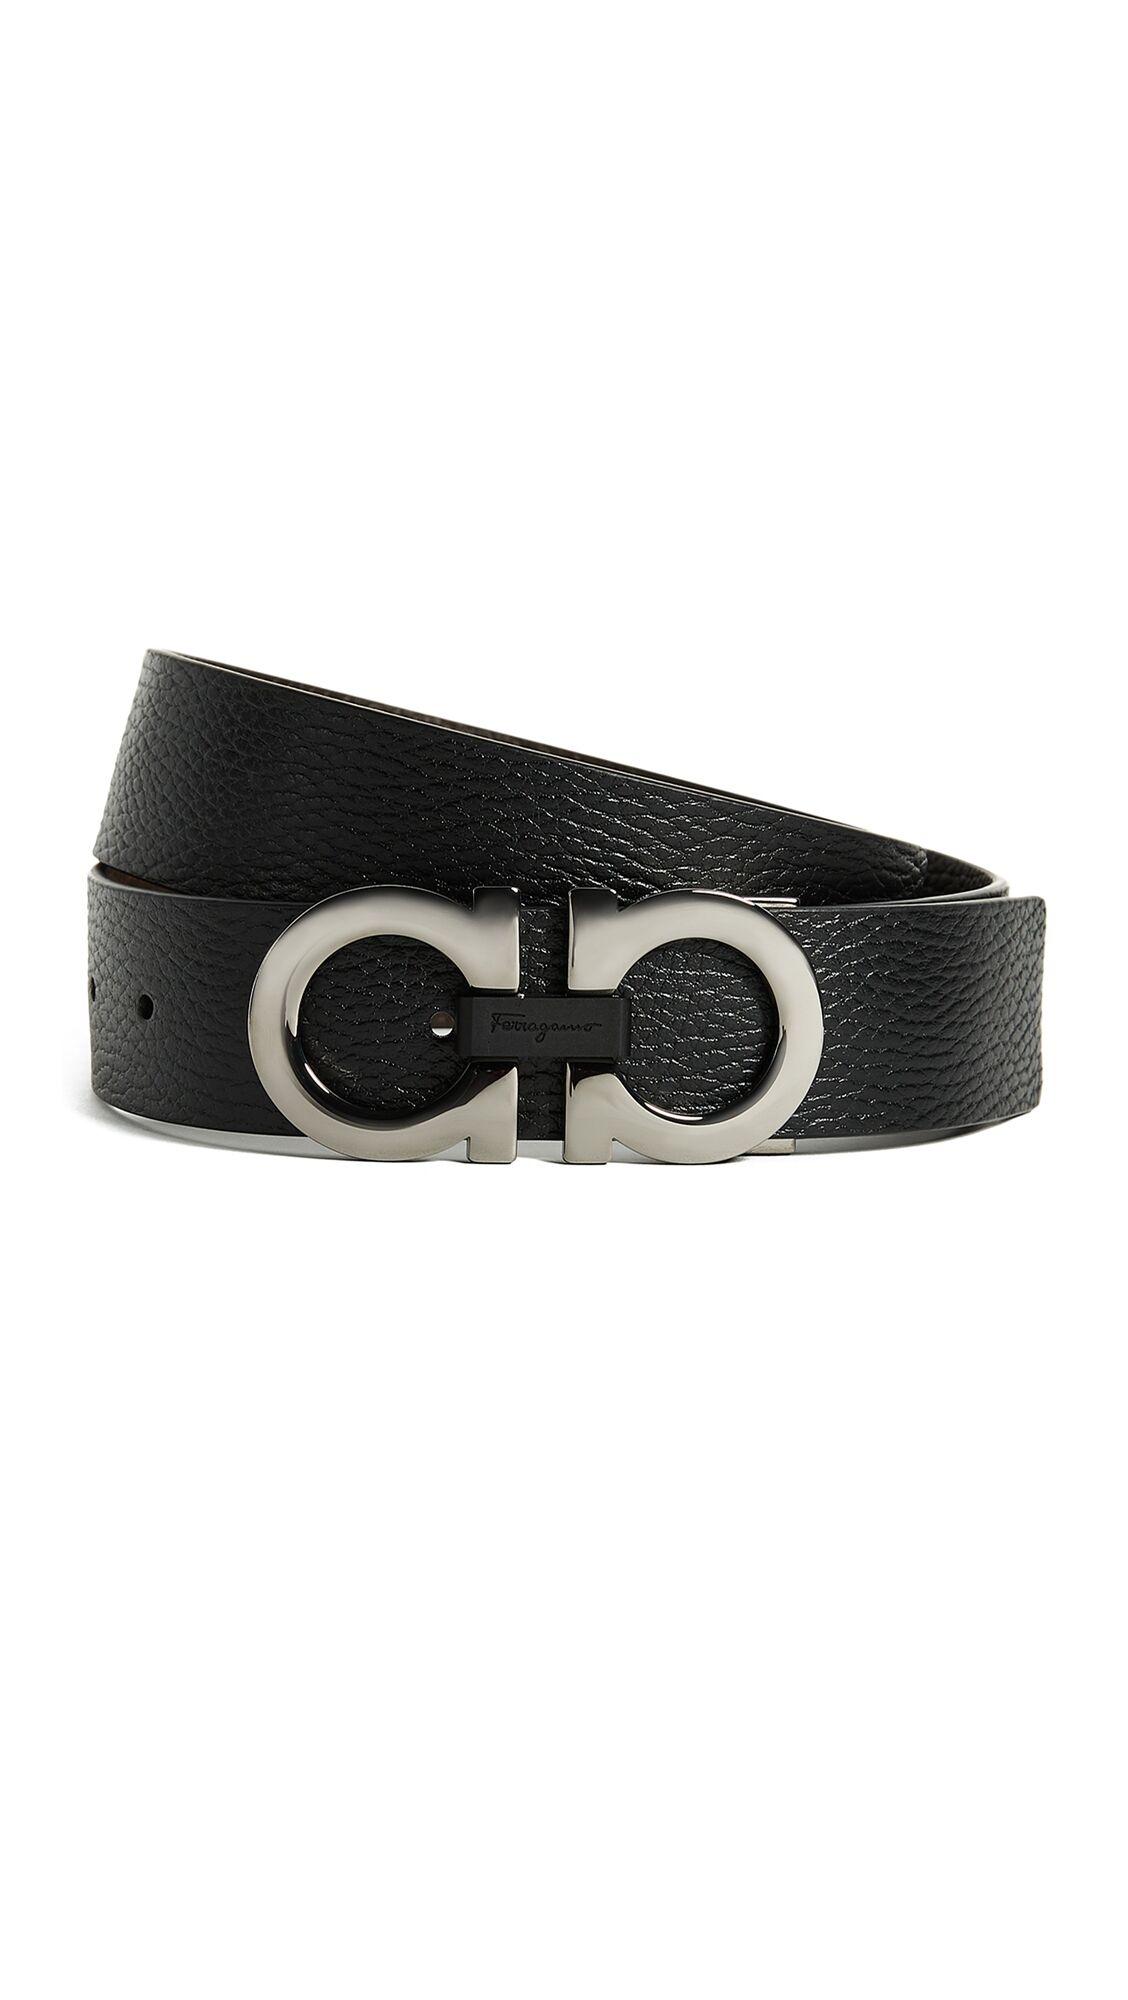 Salvatore Ferragamo Double Gancini Reversible Belt - Black/Brown - Size: 40